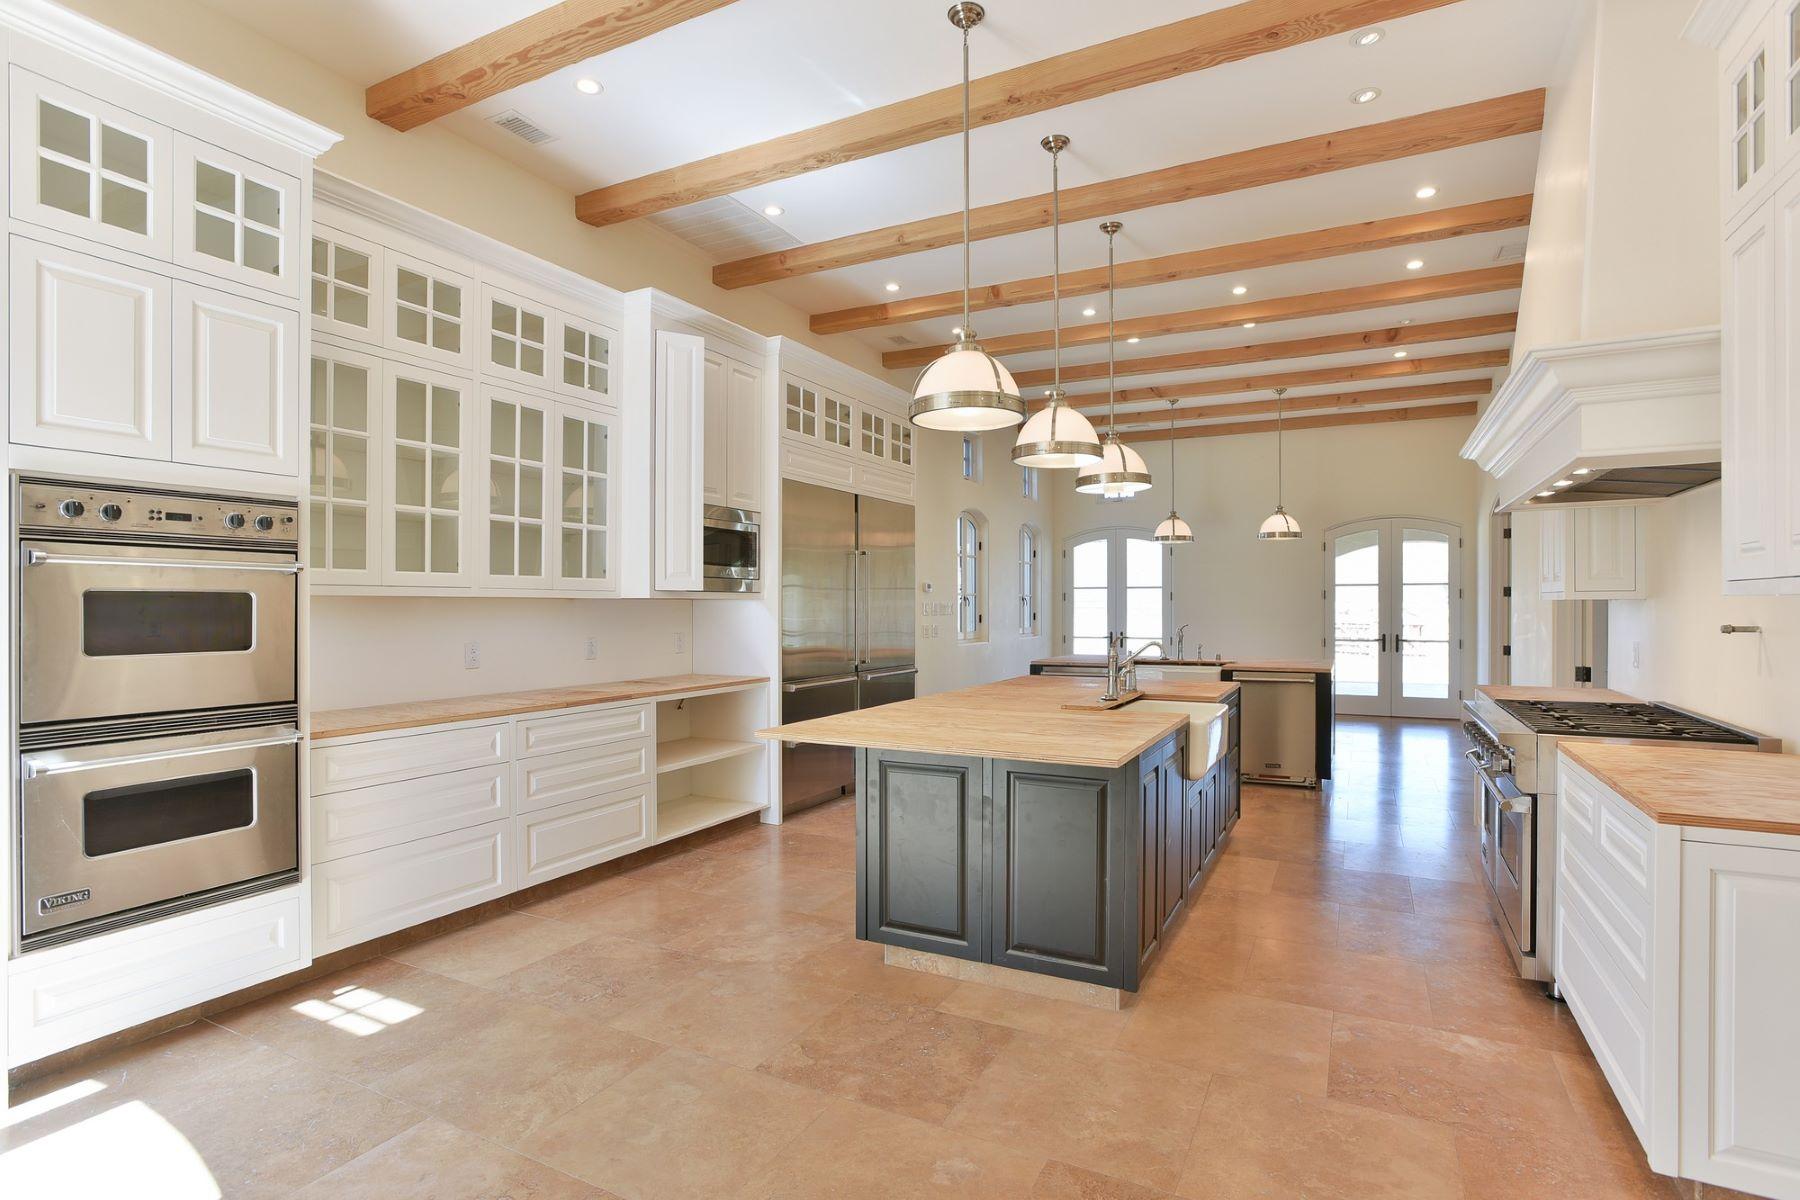 Single Family Home for Sale at 16575 Zumaque 16575 Zumaque Rancho Santa Fe, California 92067 United States